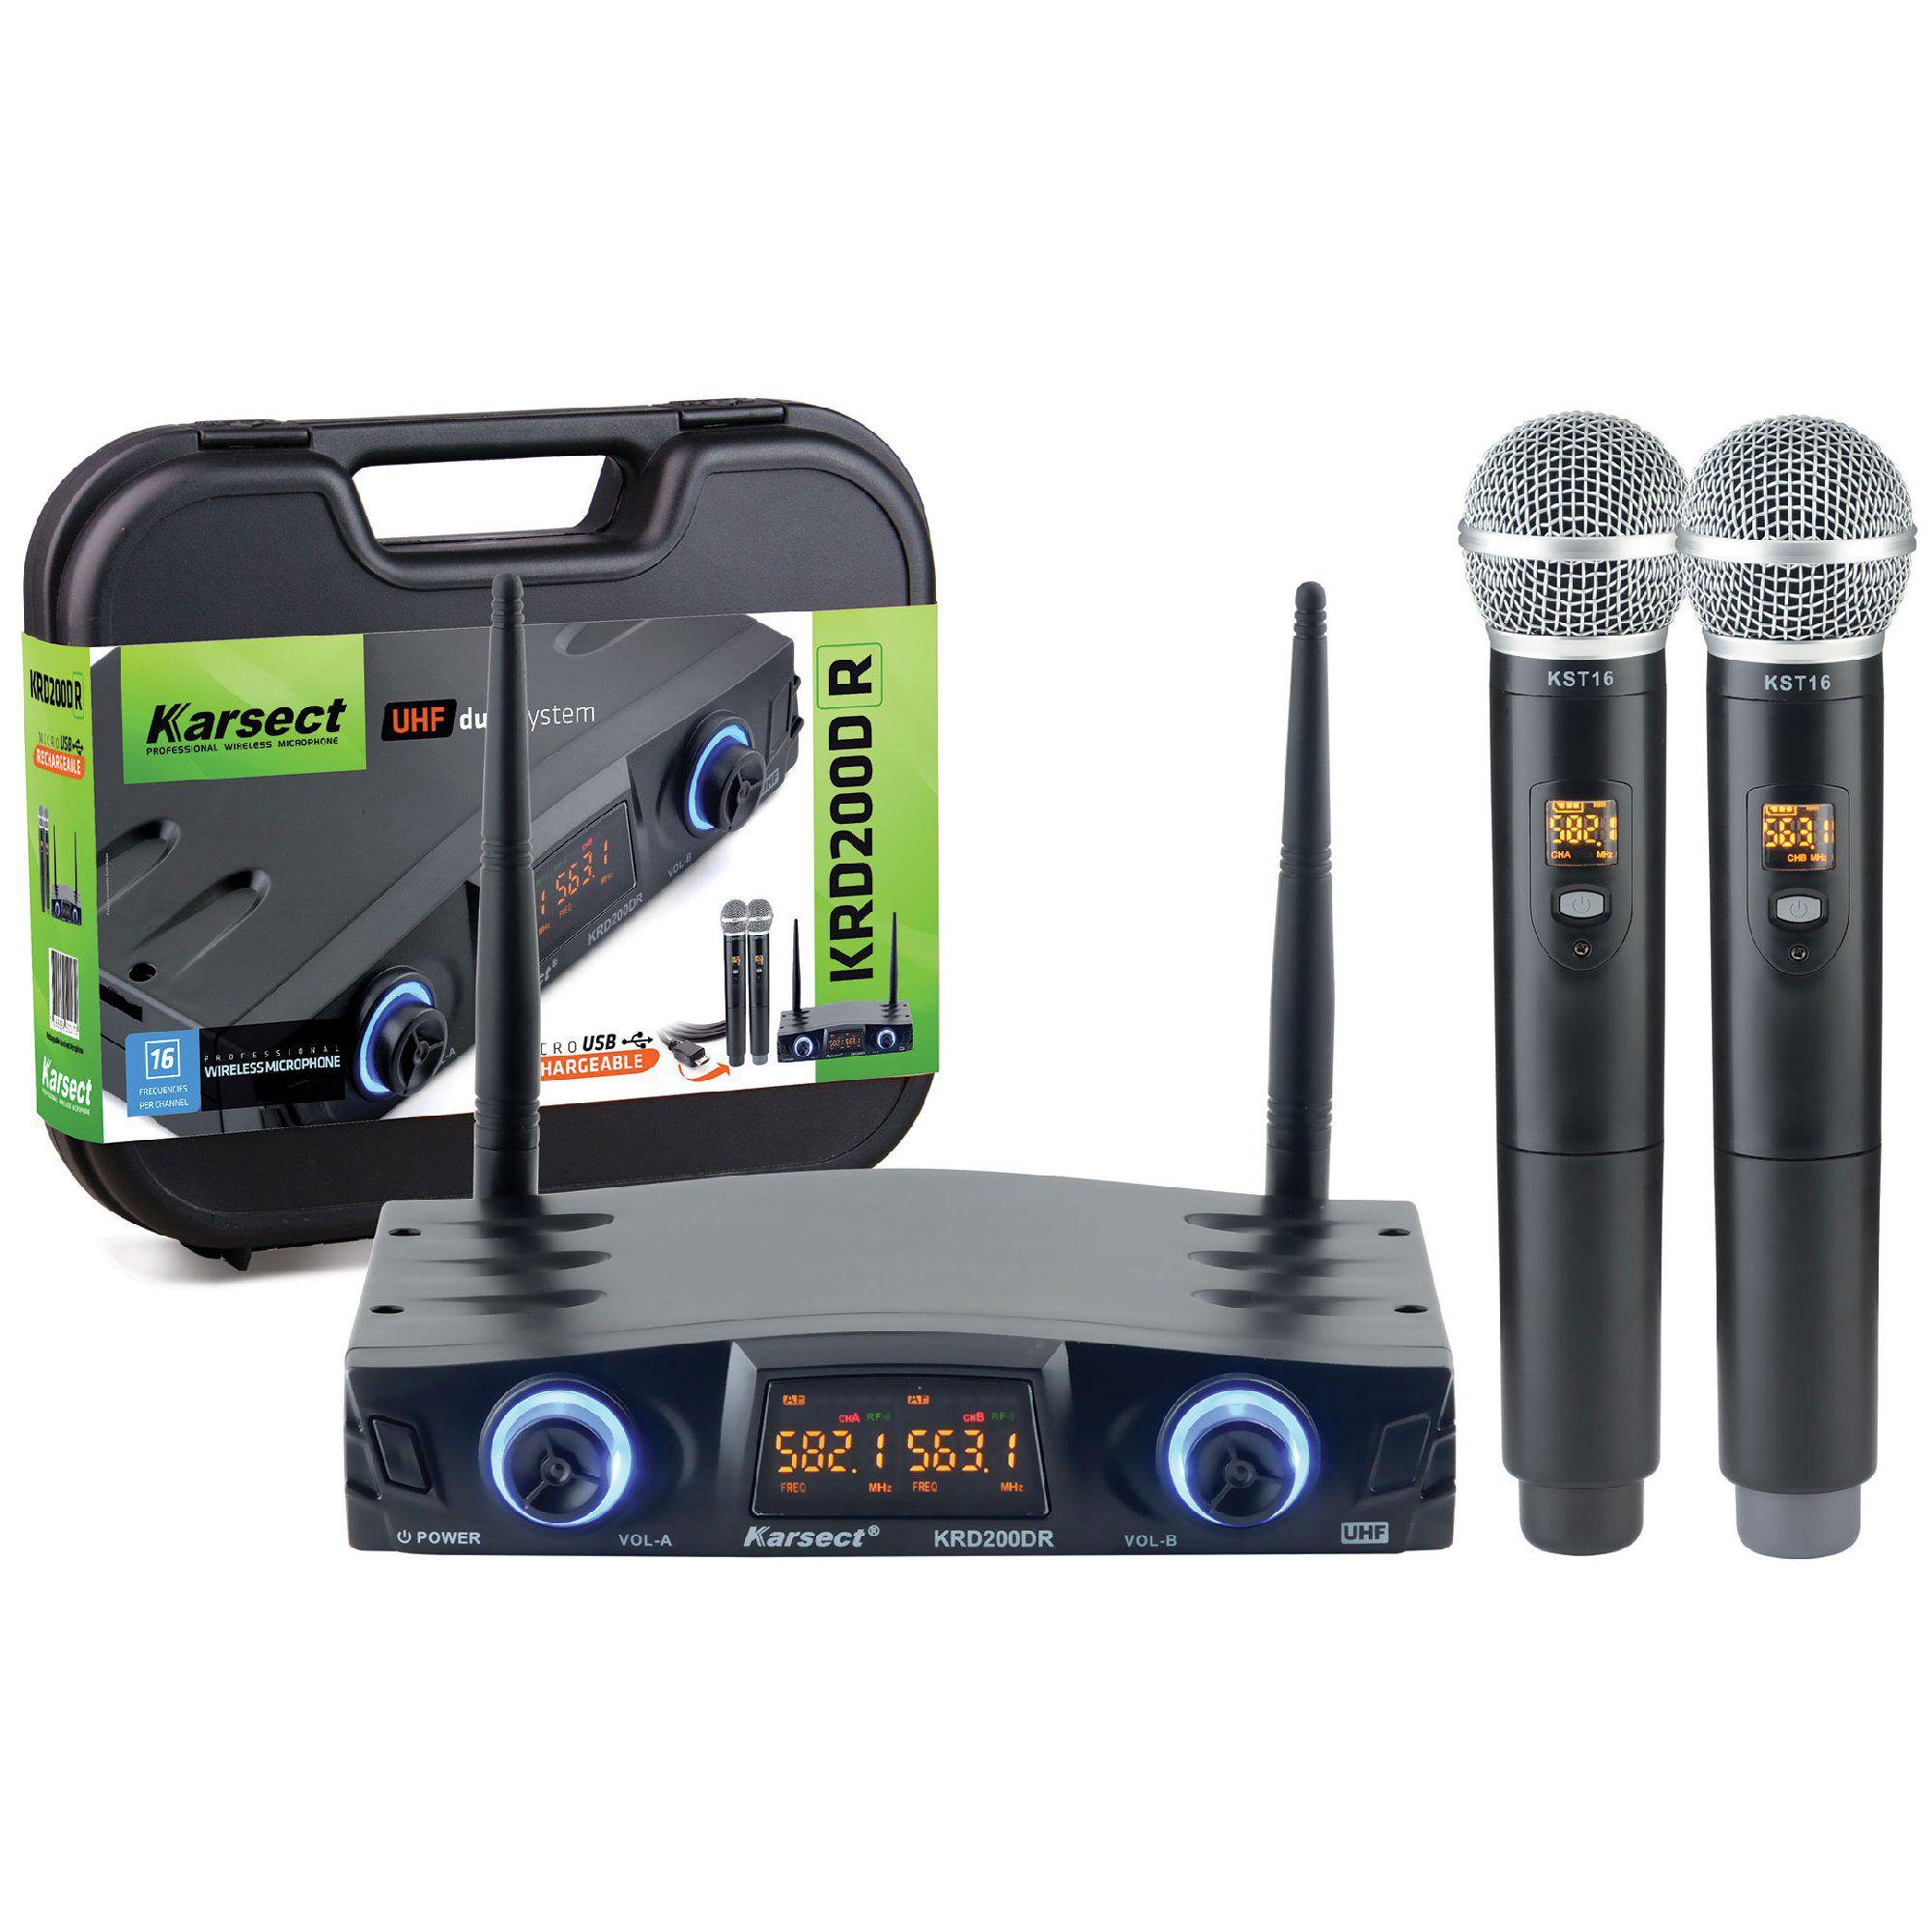 Microfone Karsect Sem Fio Krd200 Dr Bateria Recarregável